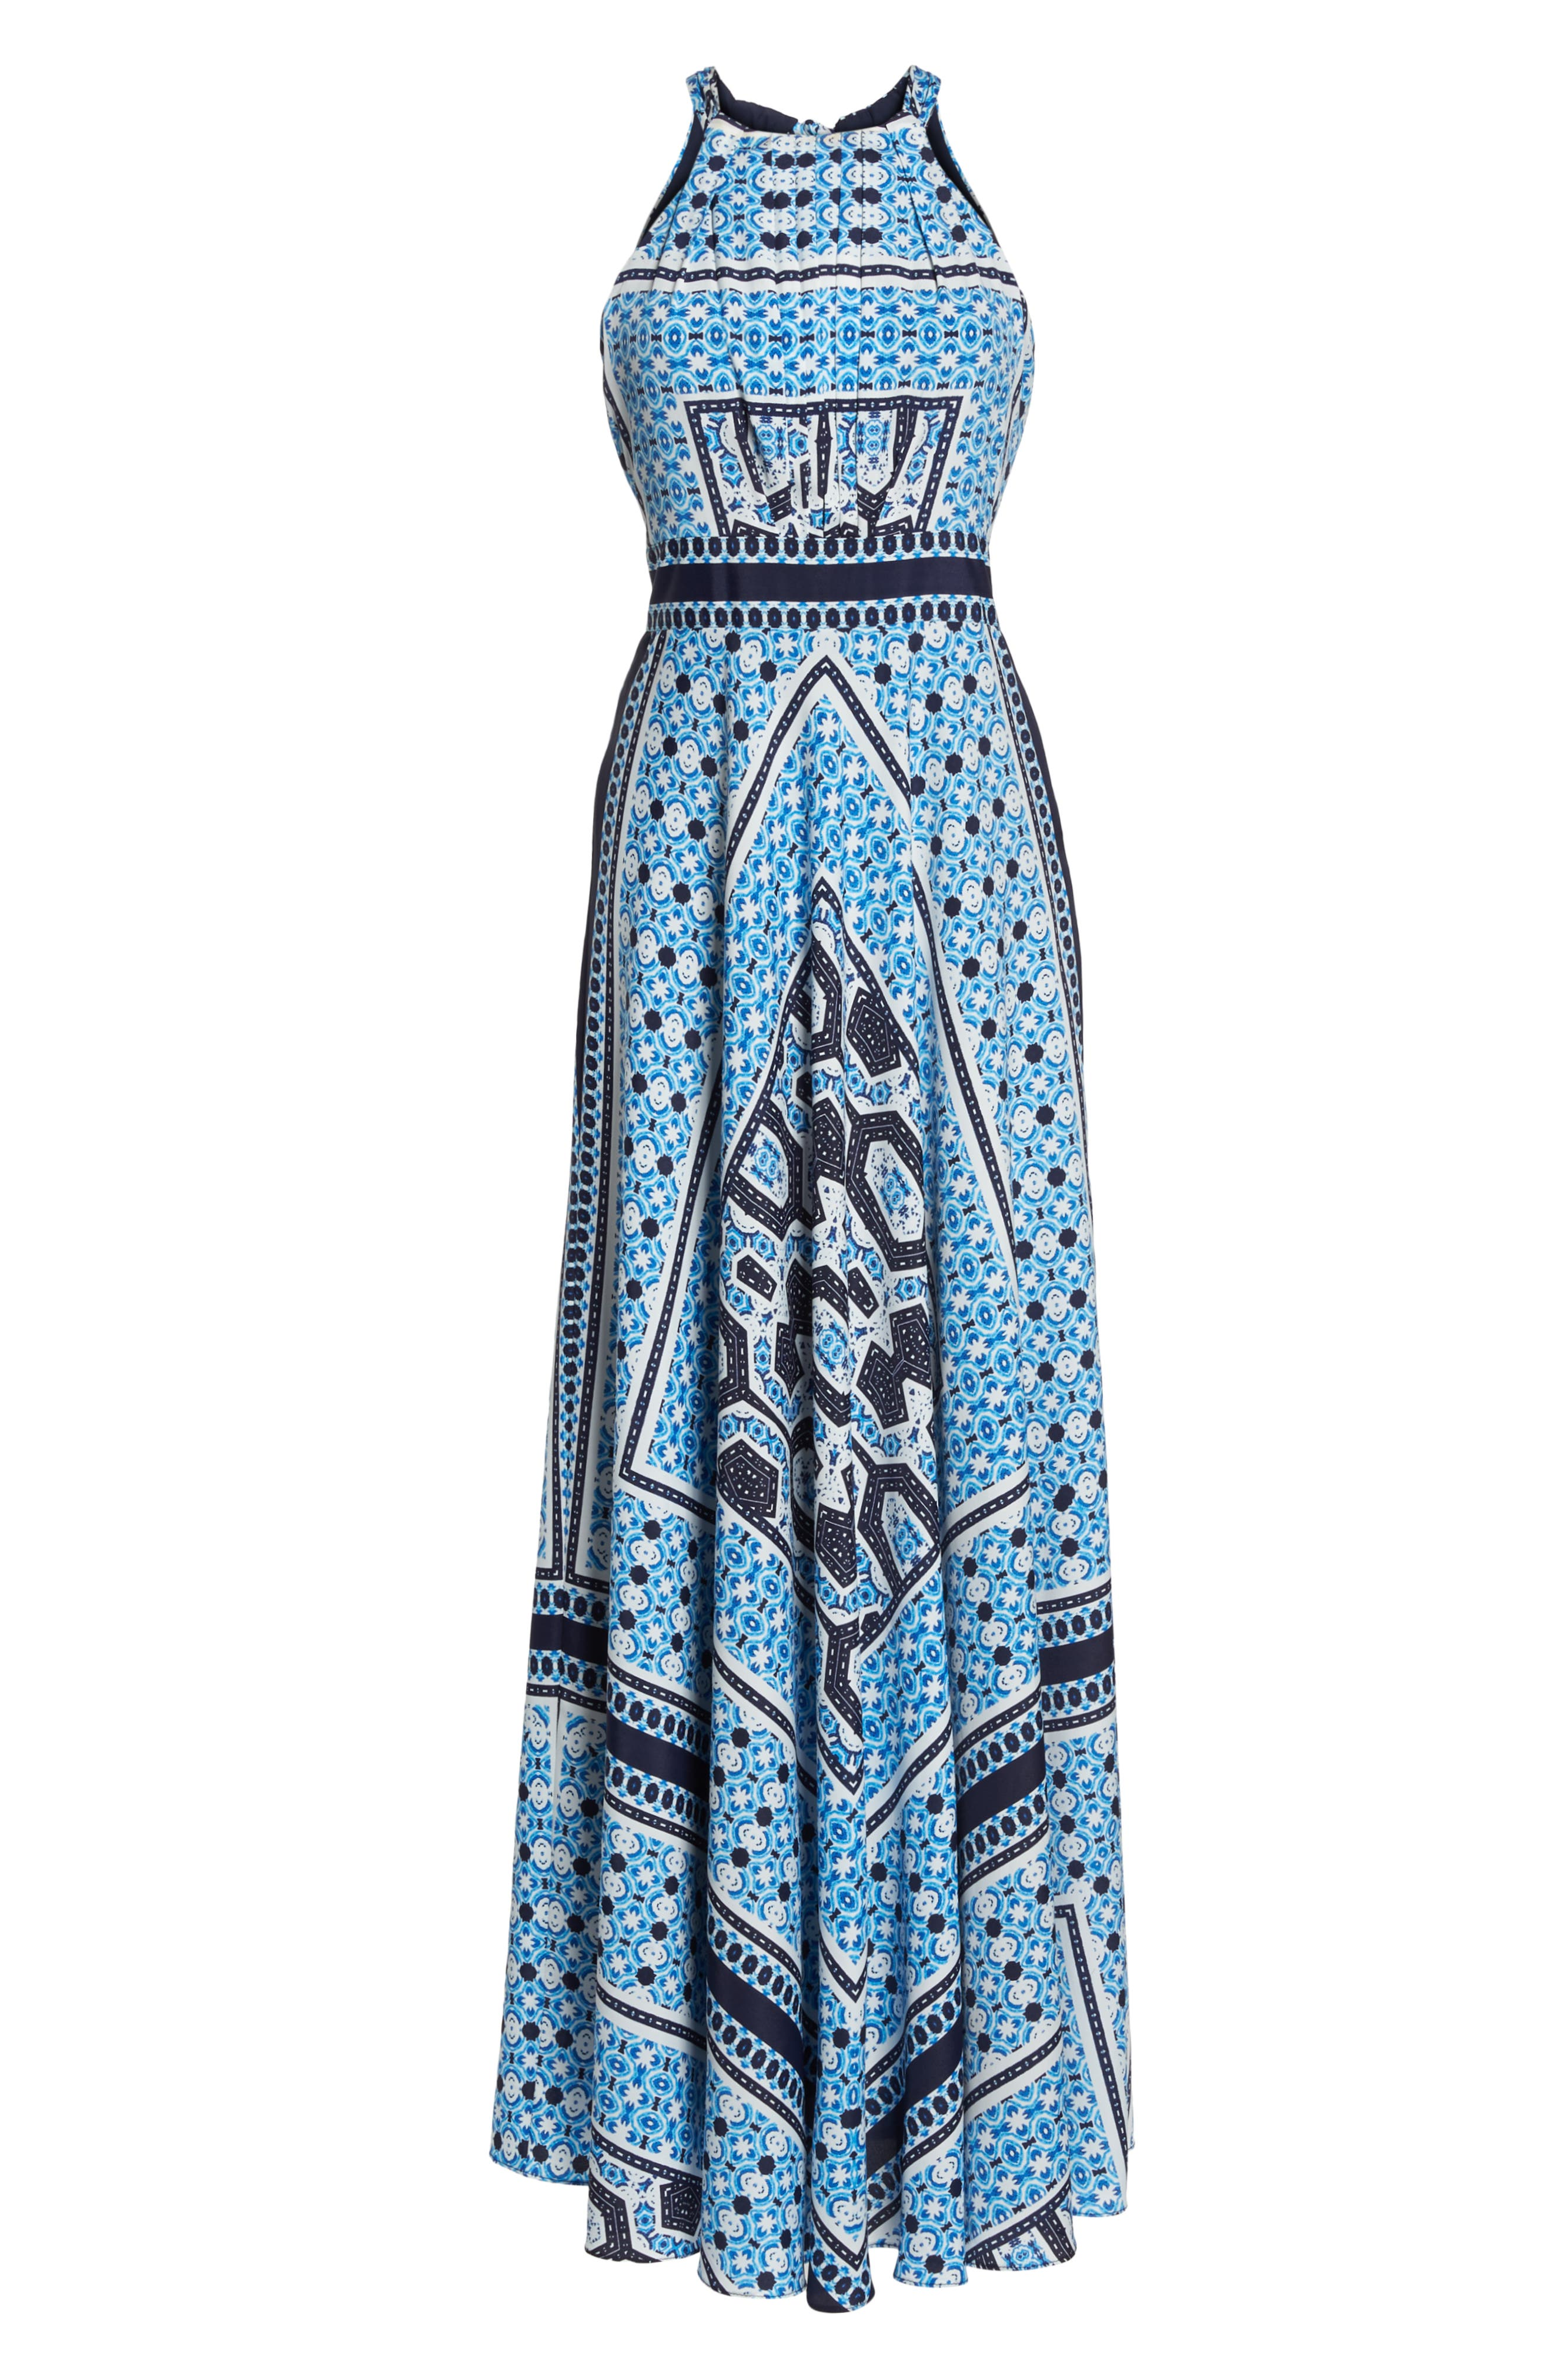 Scarf Print Halter Neck Maxi Dress,                             Alternate thumbnail 7, color,                             421